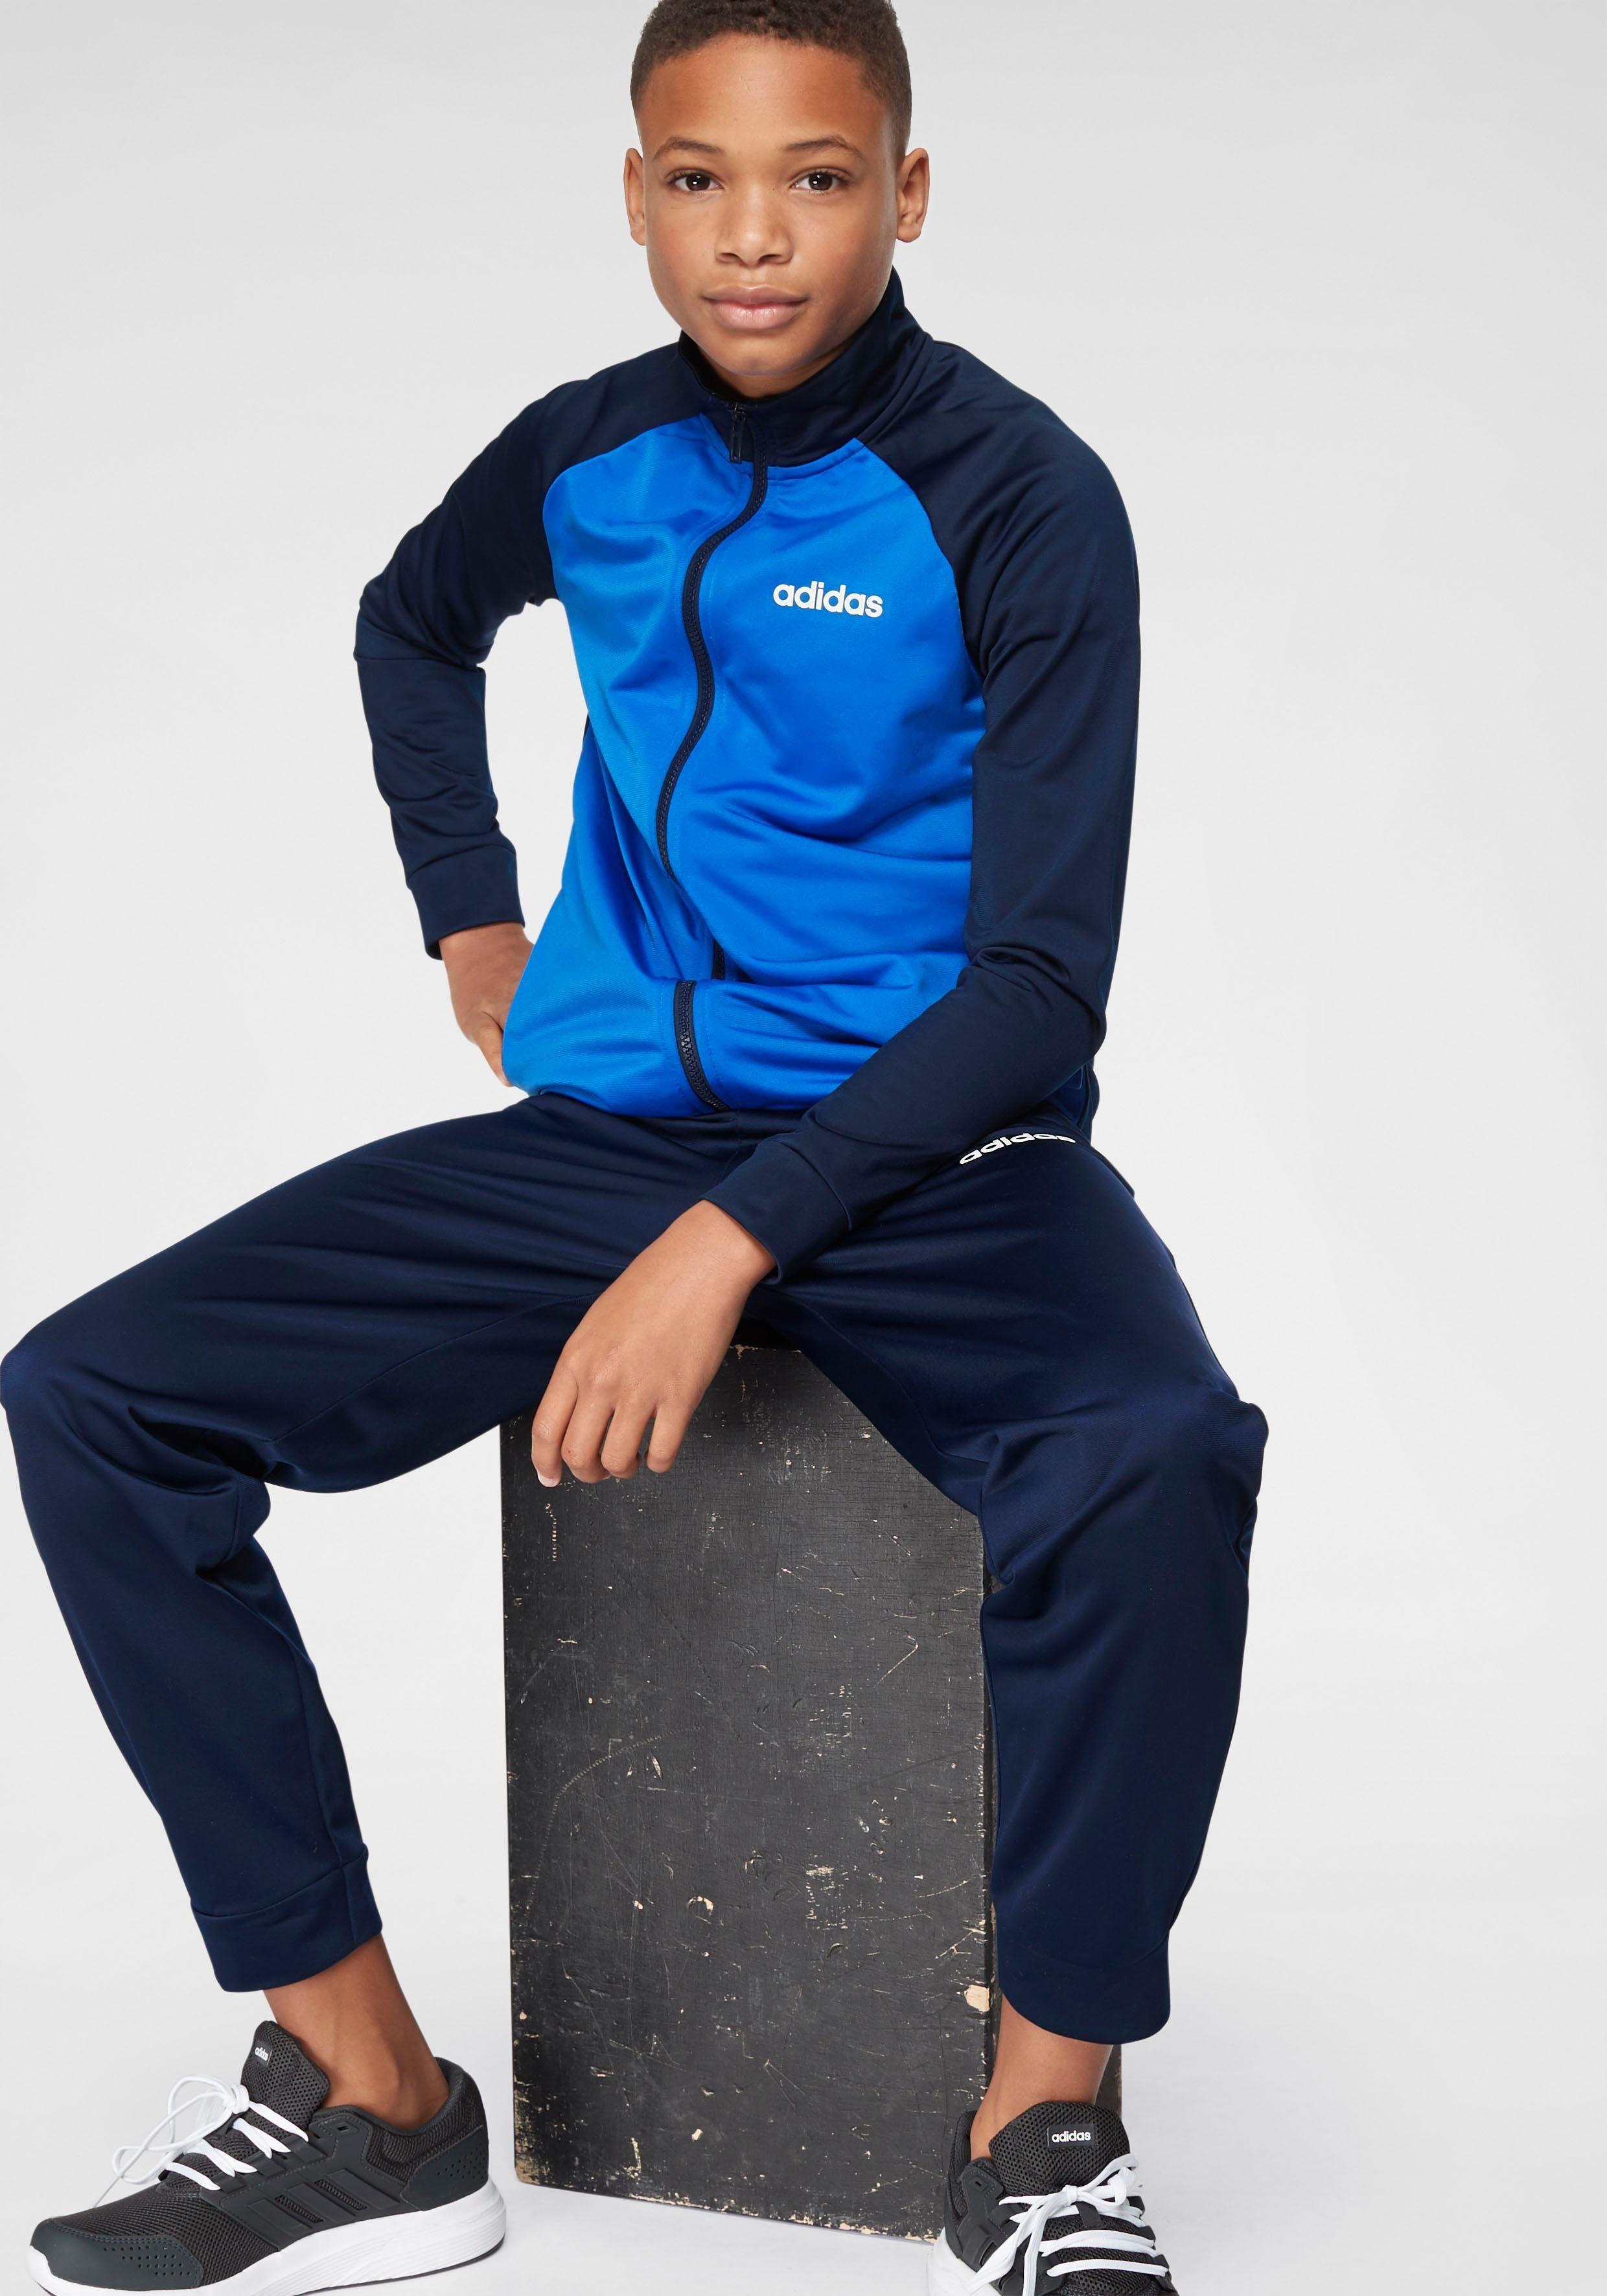 adidas Trainingsanzug »YOUNG BOY TRACKSUIT ENTRY« (Set, 2 tlg) online kaufen | OTTO